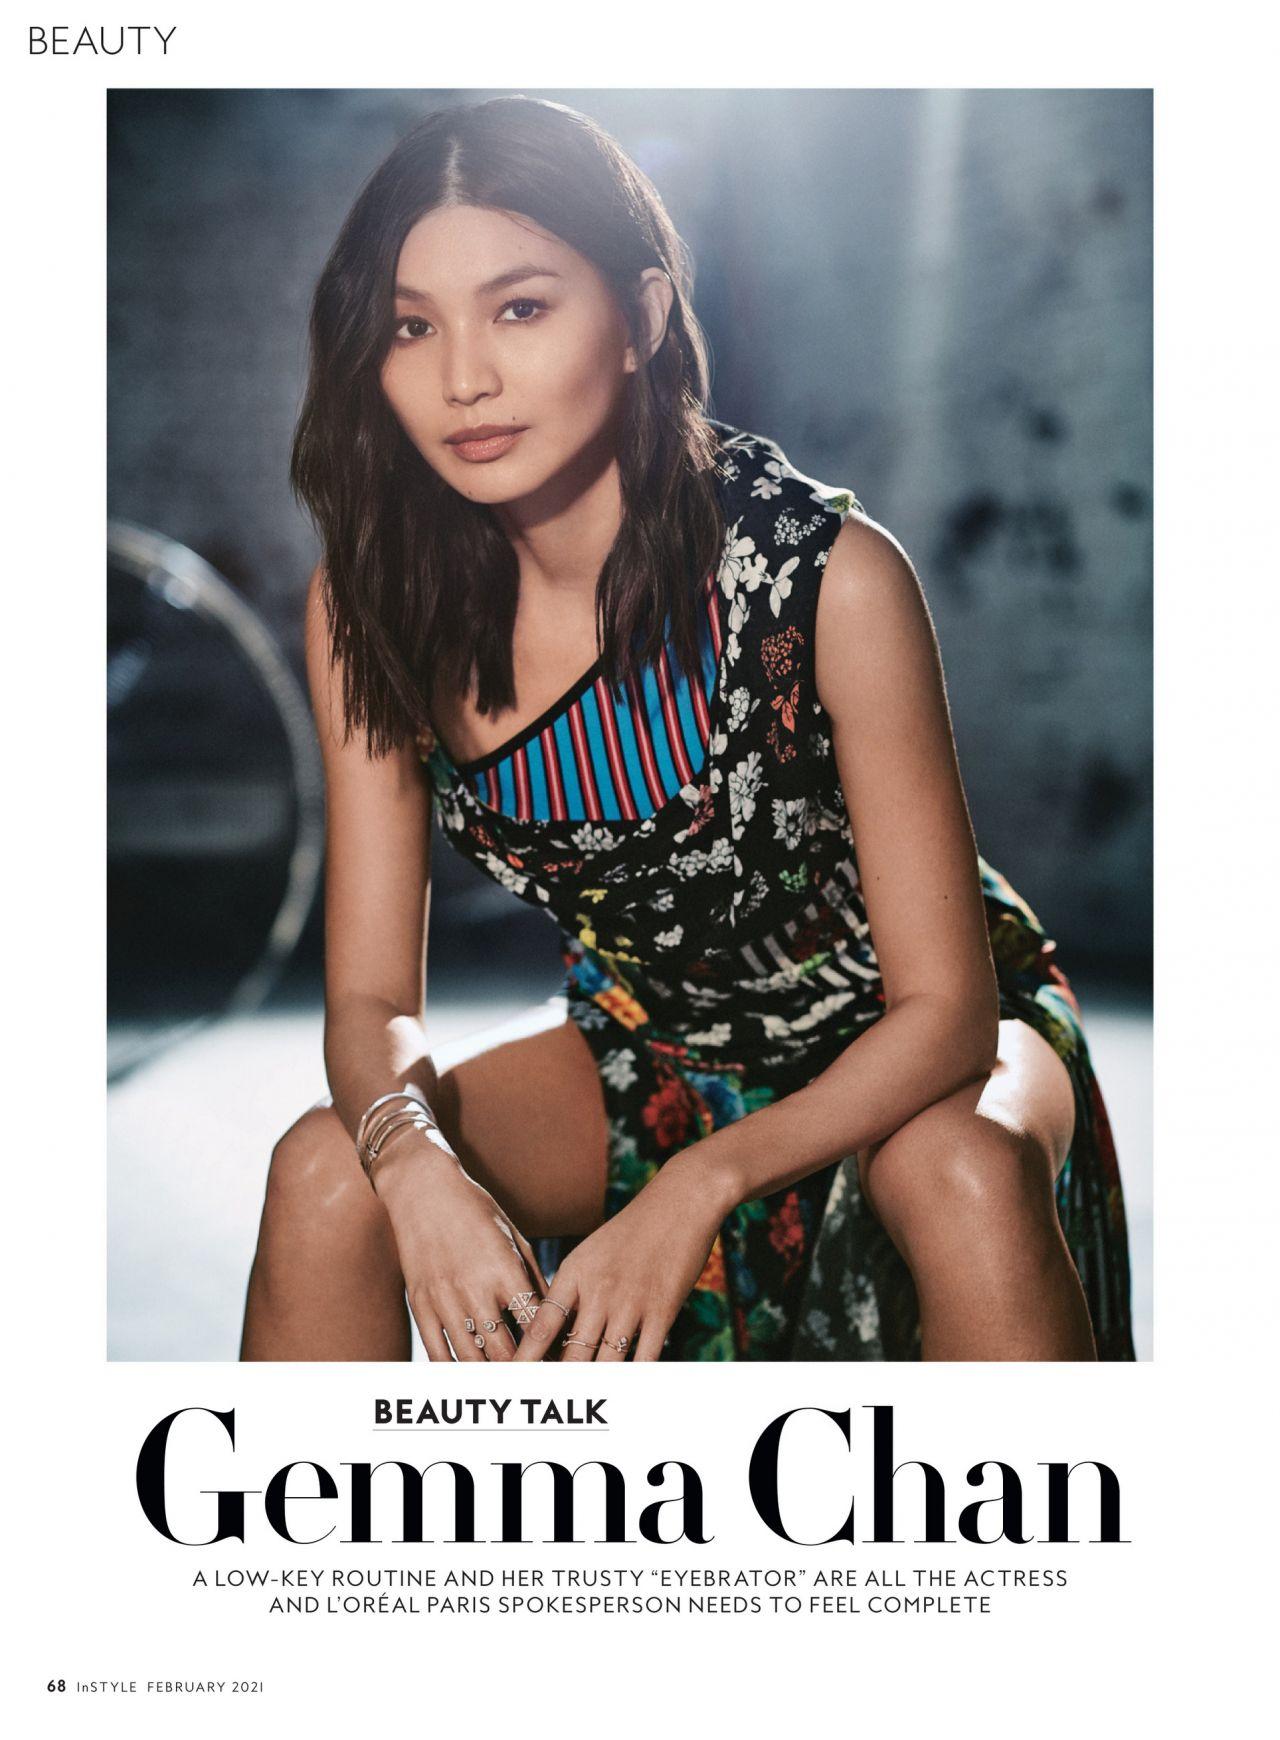 Gemma Chan Style Clothes Outfits And Fashion Celebmafia